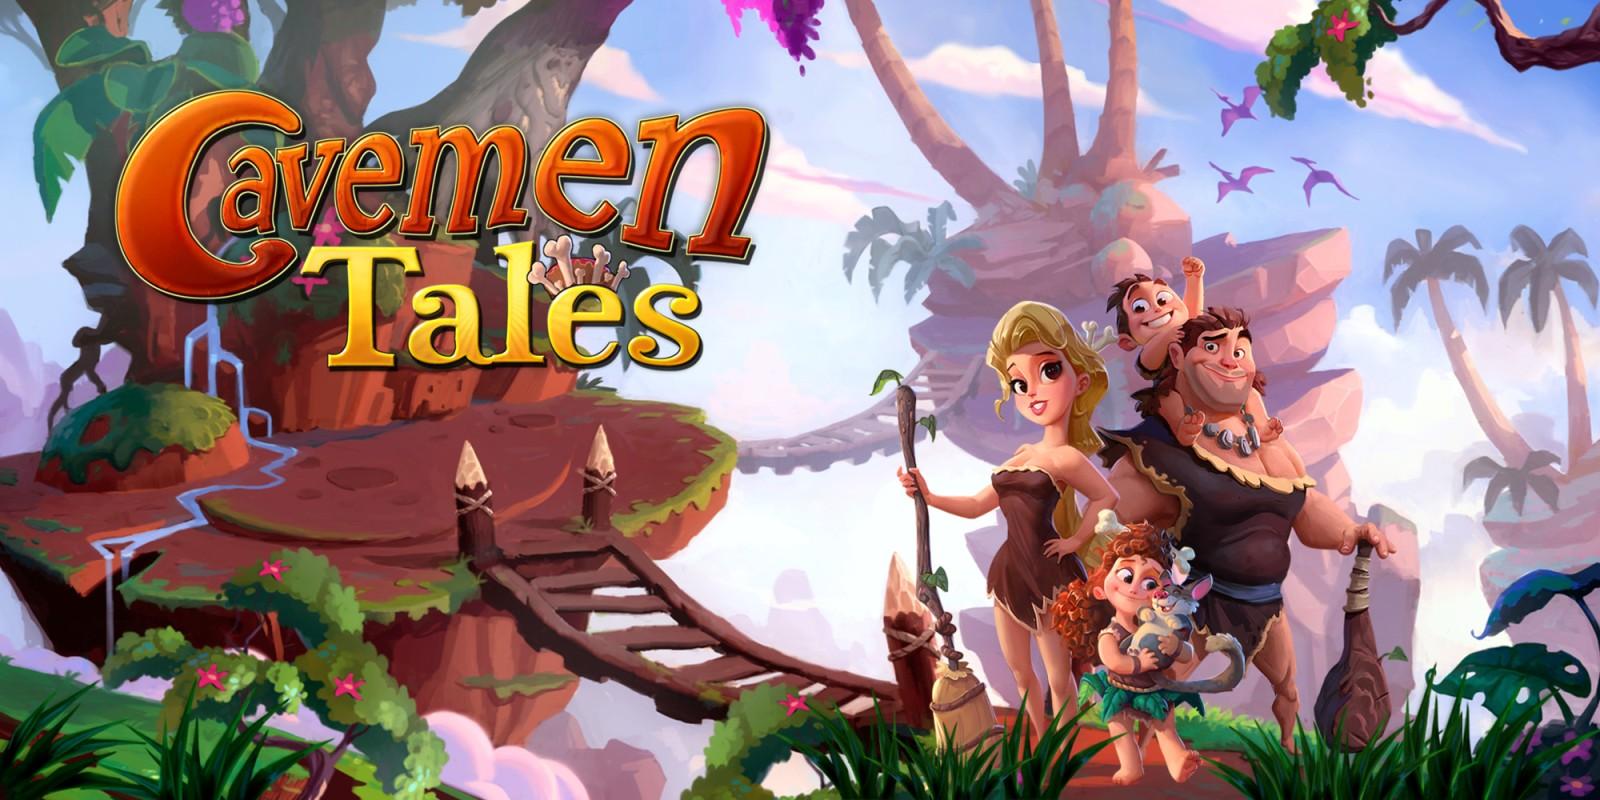 Caveman Tales